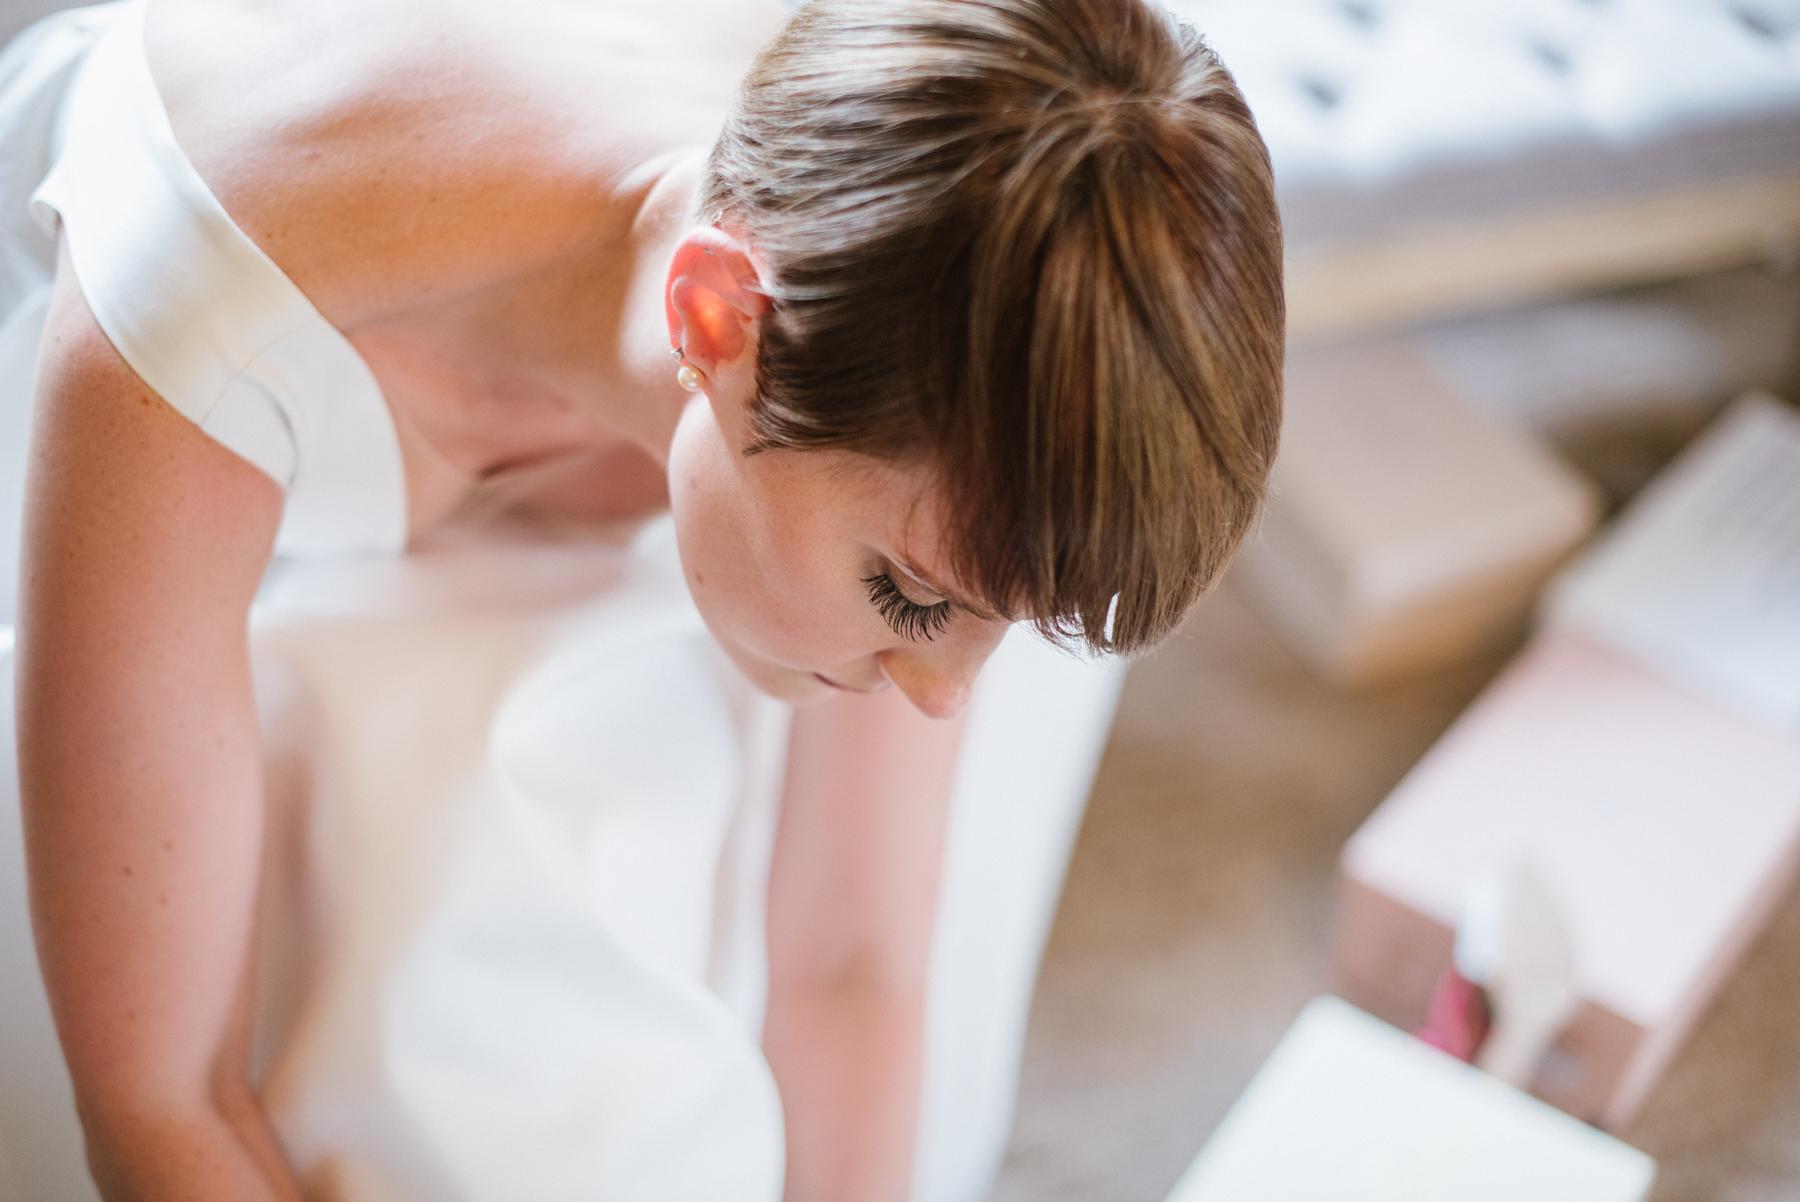 Secret Garden Event Center Wedding - Meredith Amadee Photography-2-4.jpg